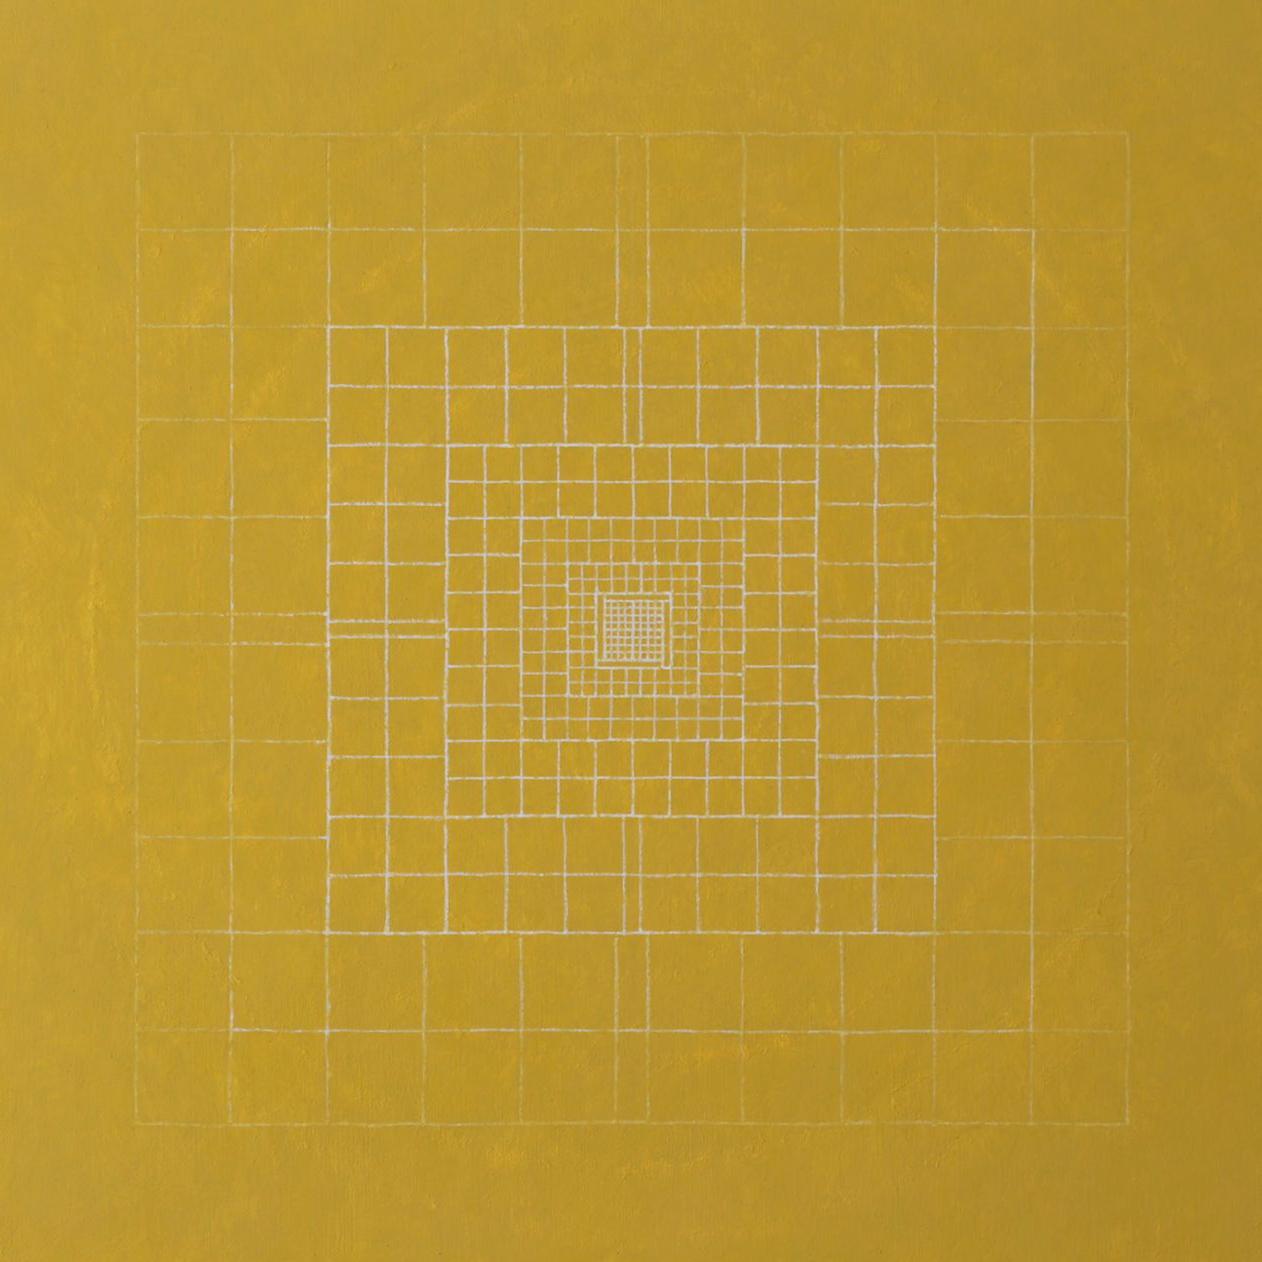 Silent-origo-metrum, 2014, acrylic on canvas, 17 3/4 x 17 3/4 in. [45x45cm]